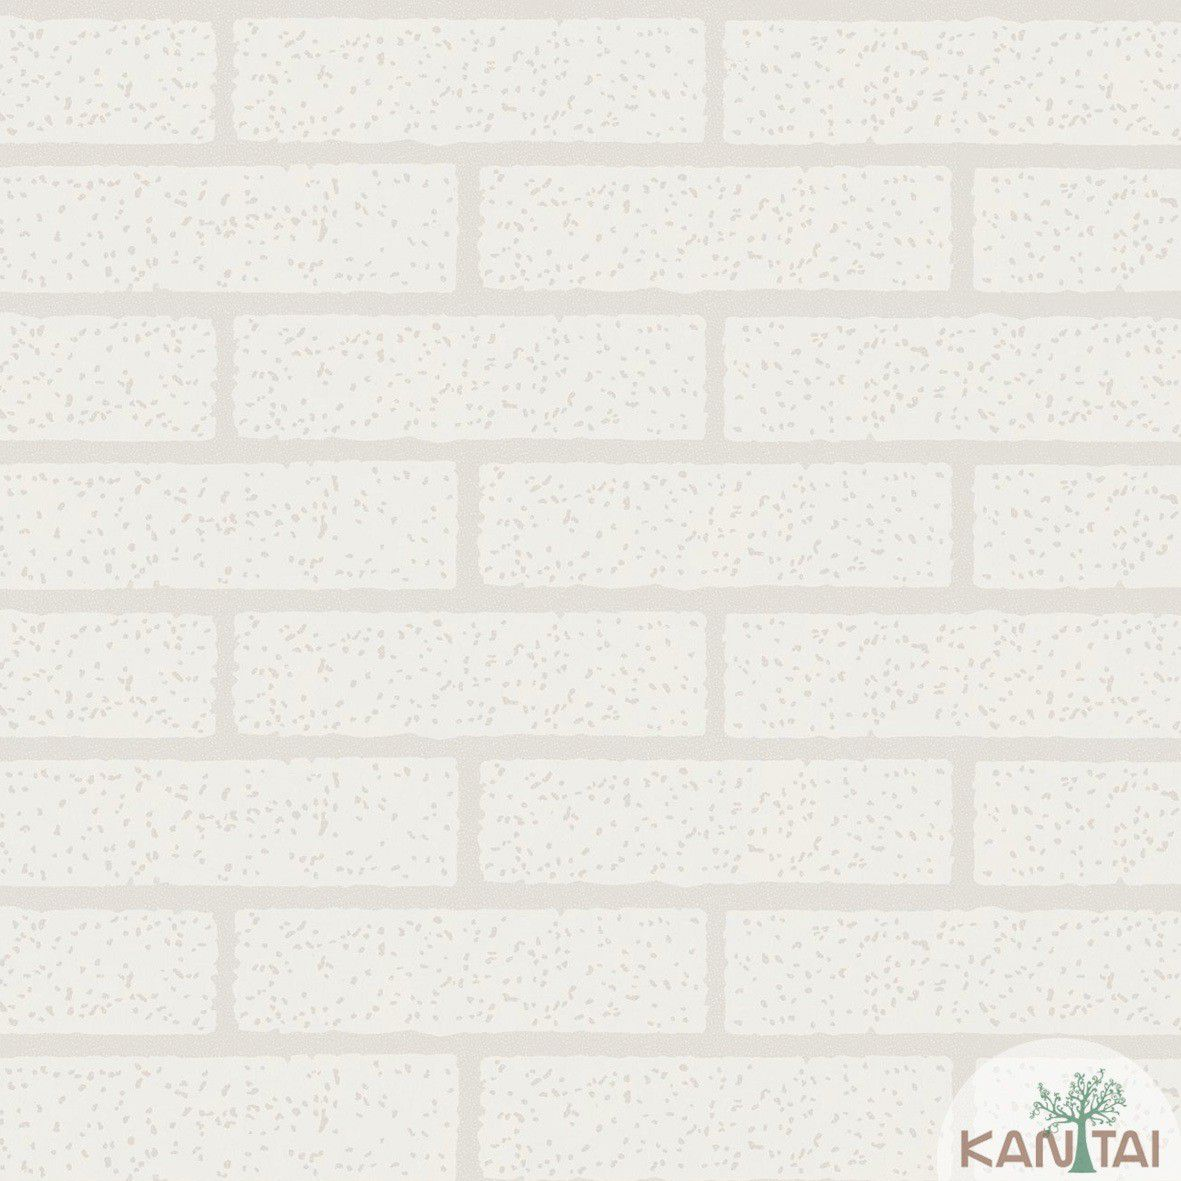 Papel de parede Kan Tai  Vinílico Coleção Style Tijolo Branco, Rejunte cinza